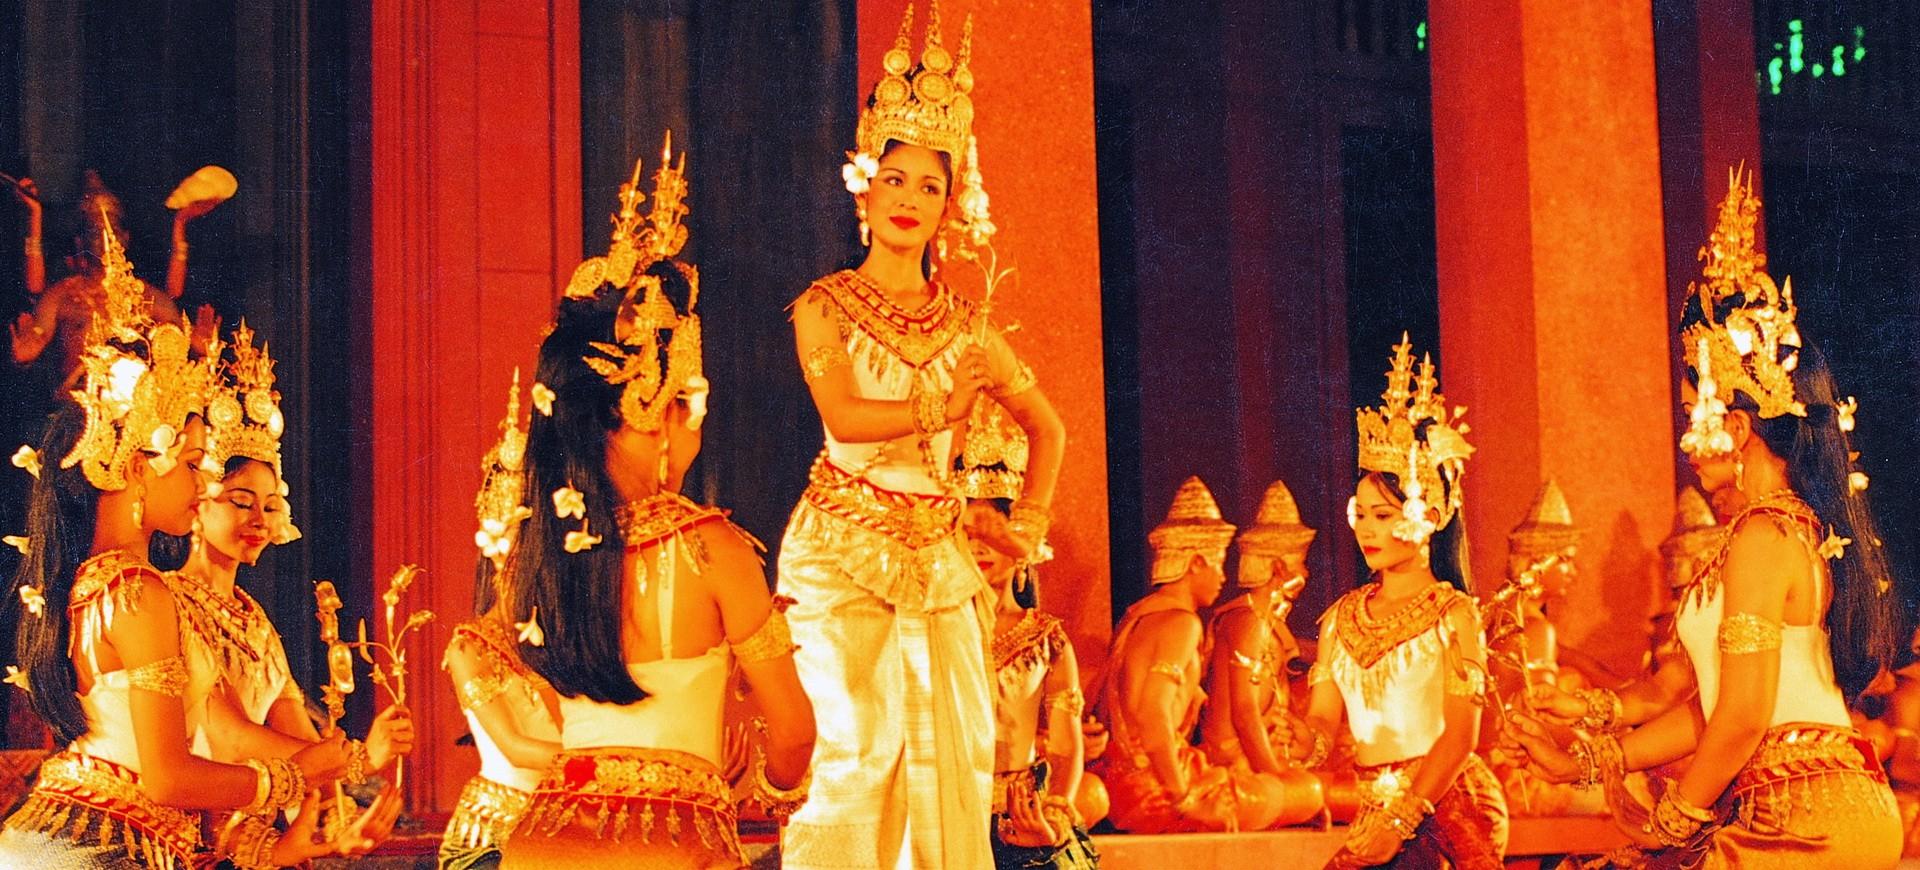 Cambodge spectacle de danse